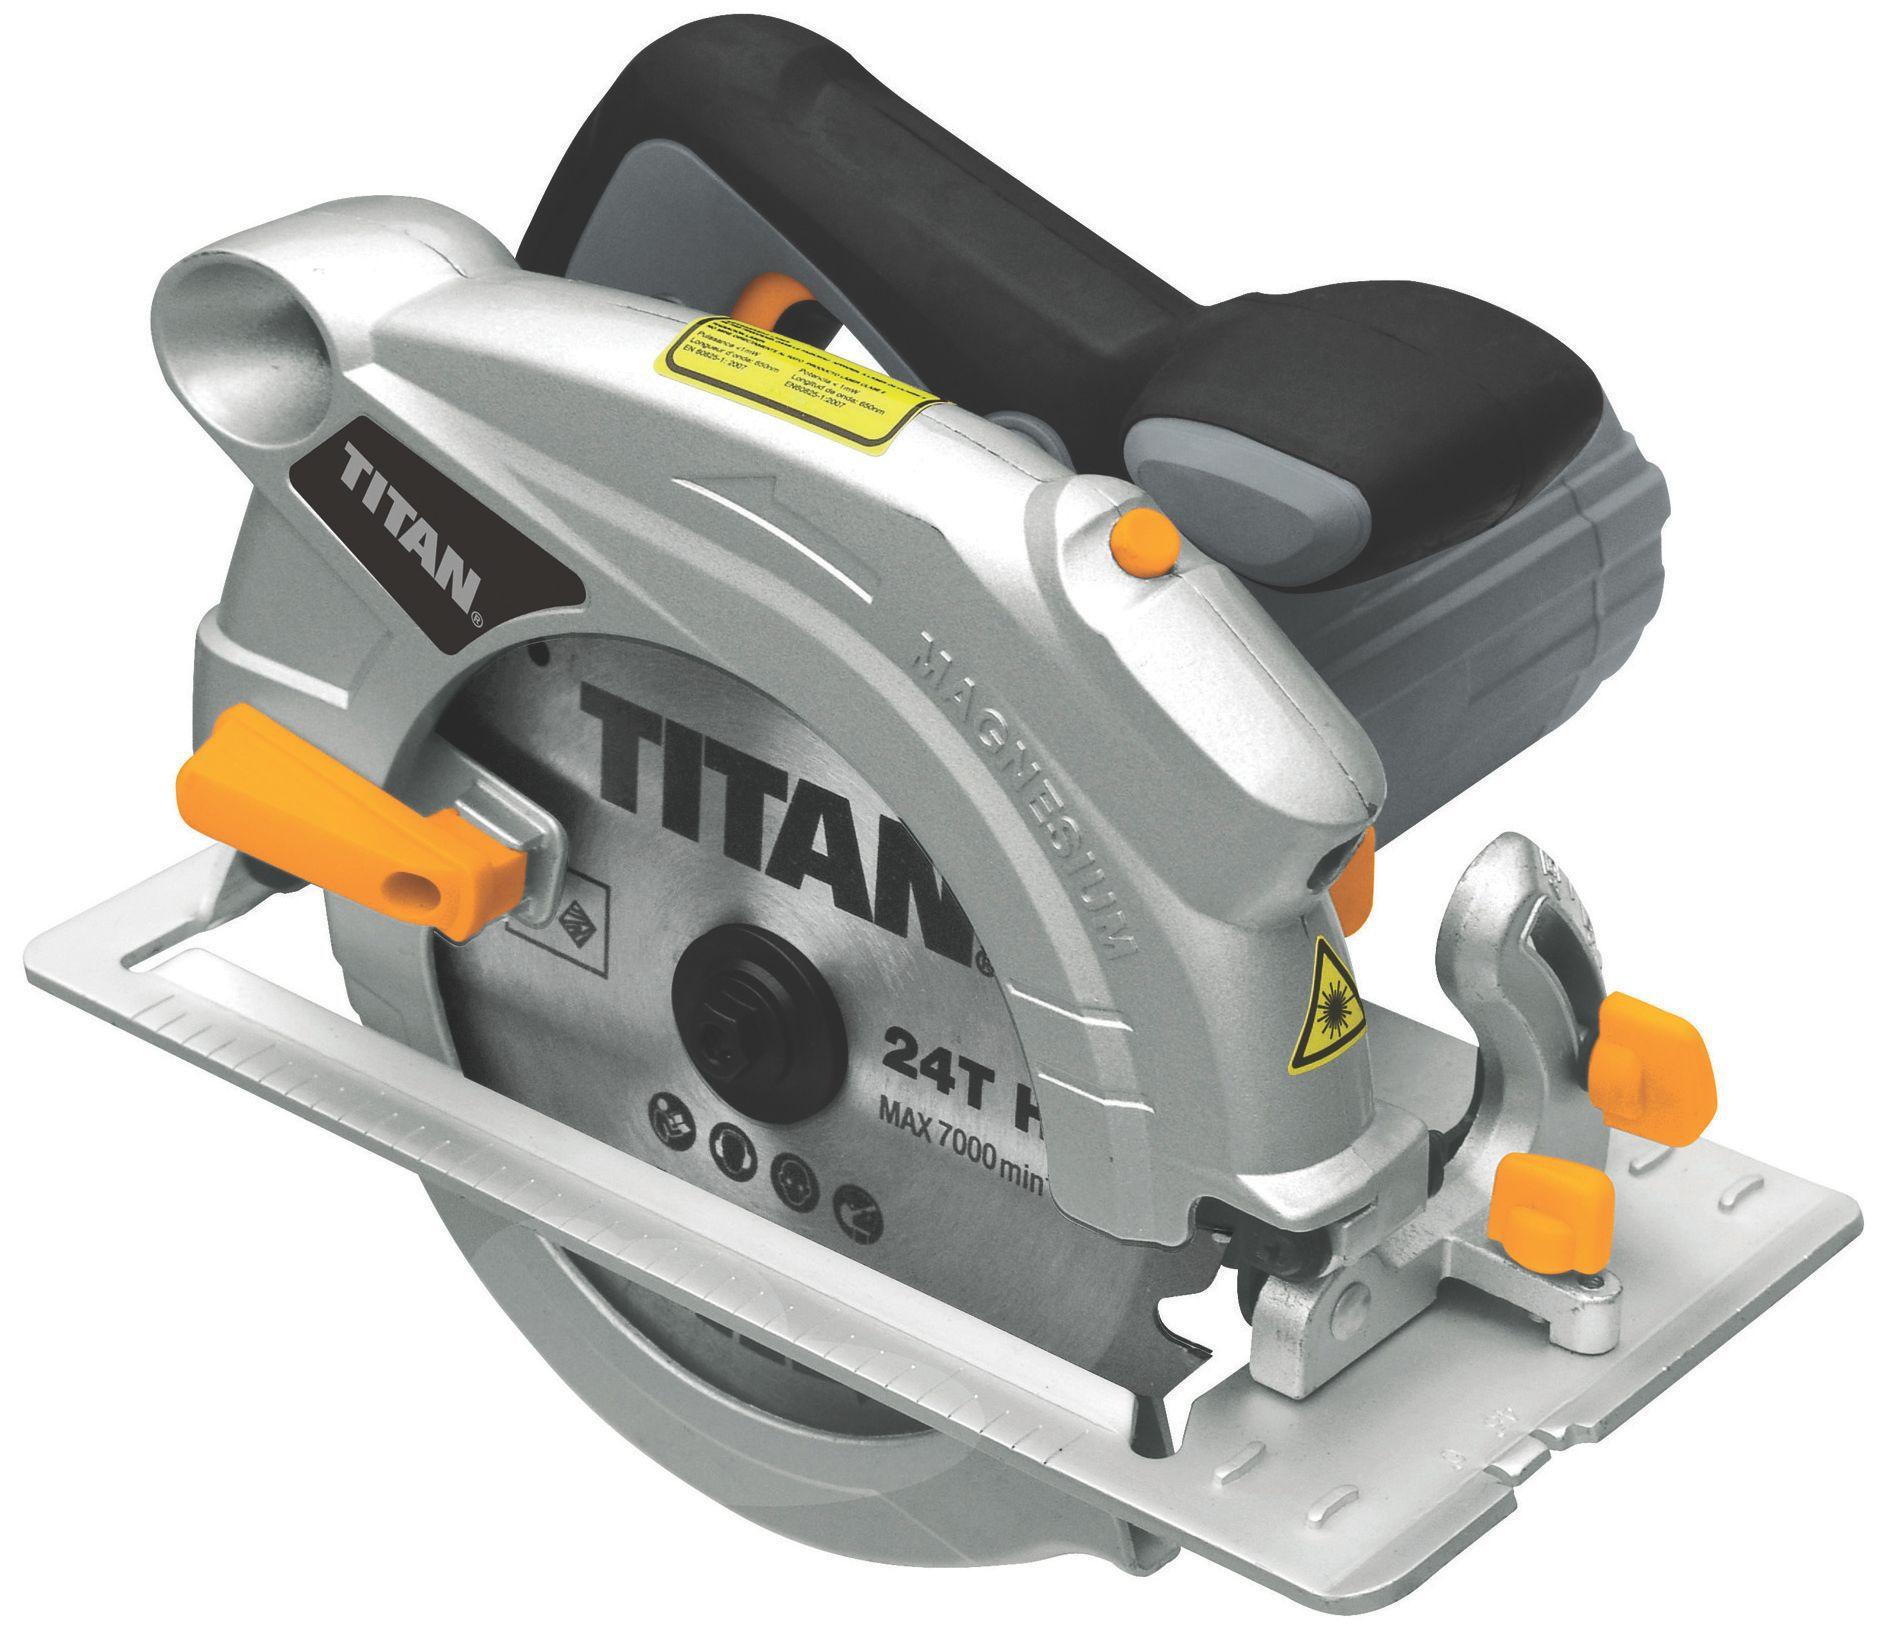 Titan 1500w 230v 190mm Circular Saw Ttb286csw